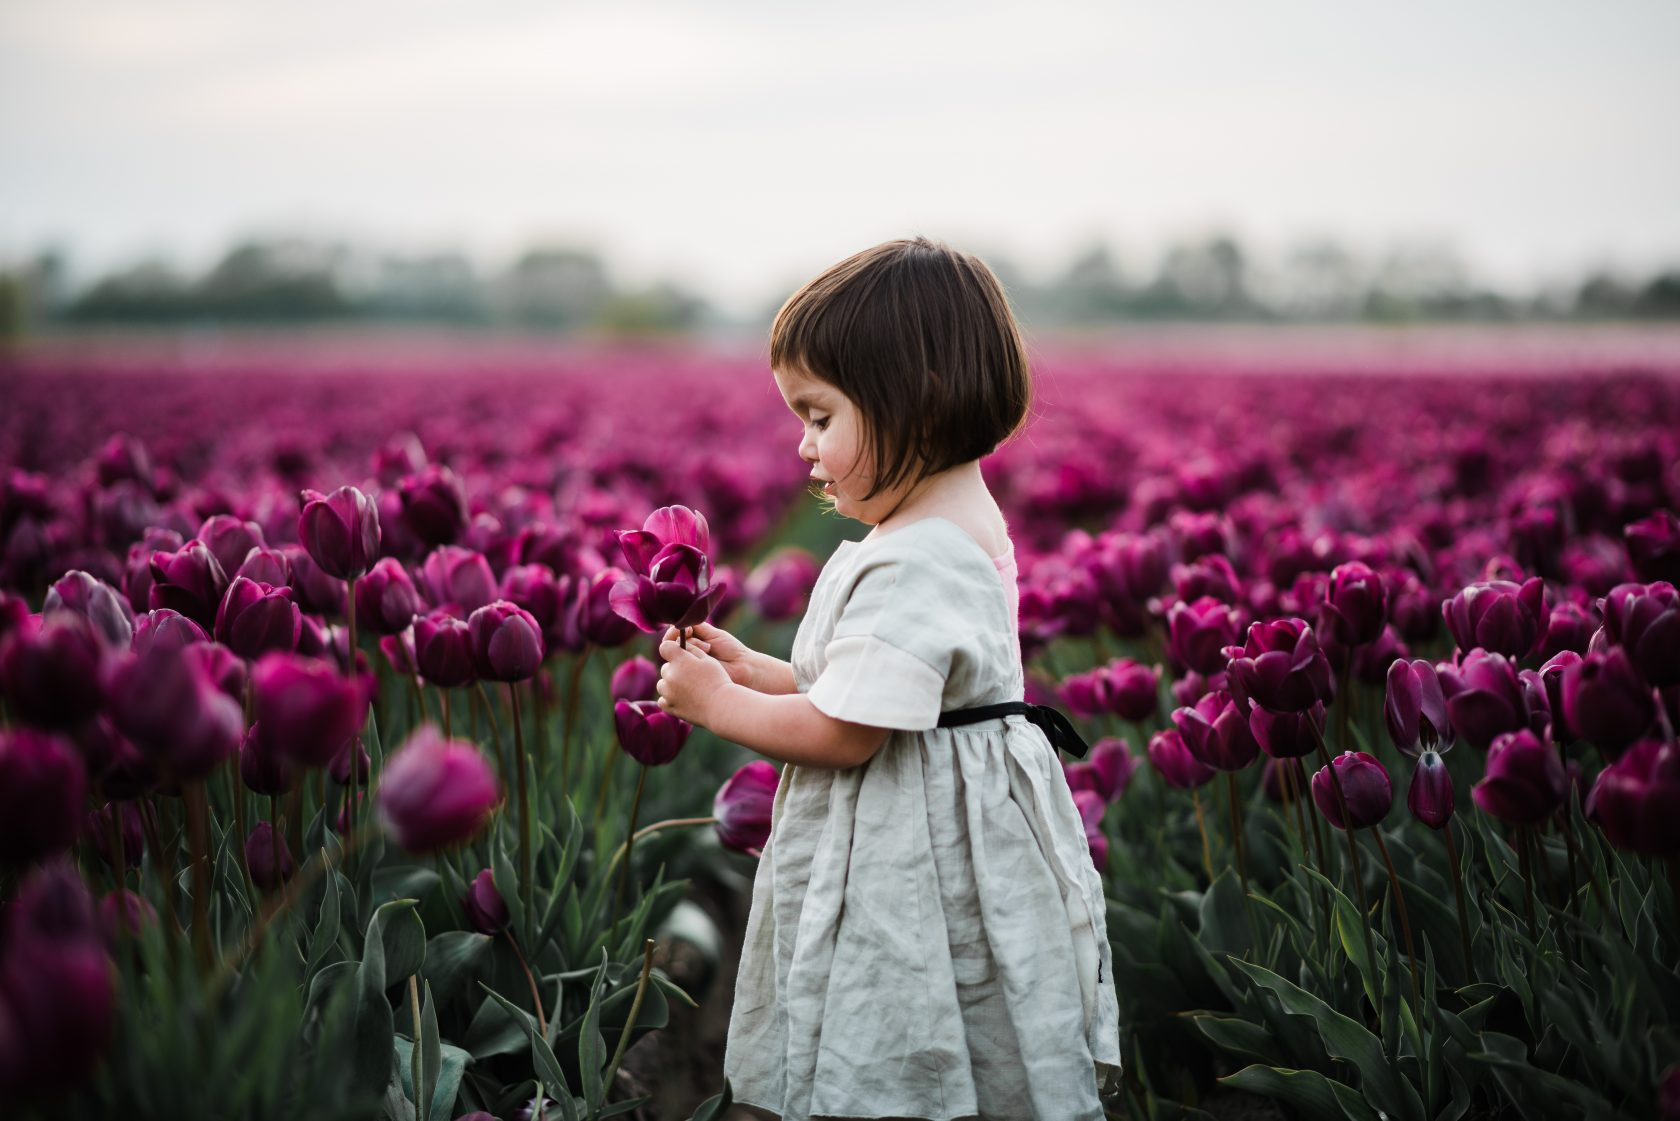 Amsterdam Keukenhof - tulips Photographer 2